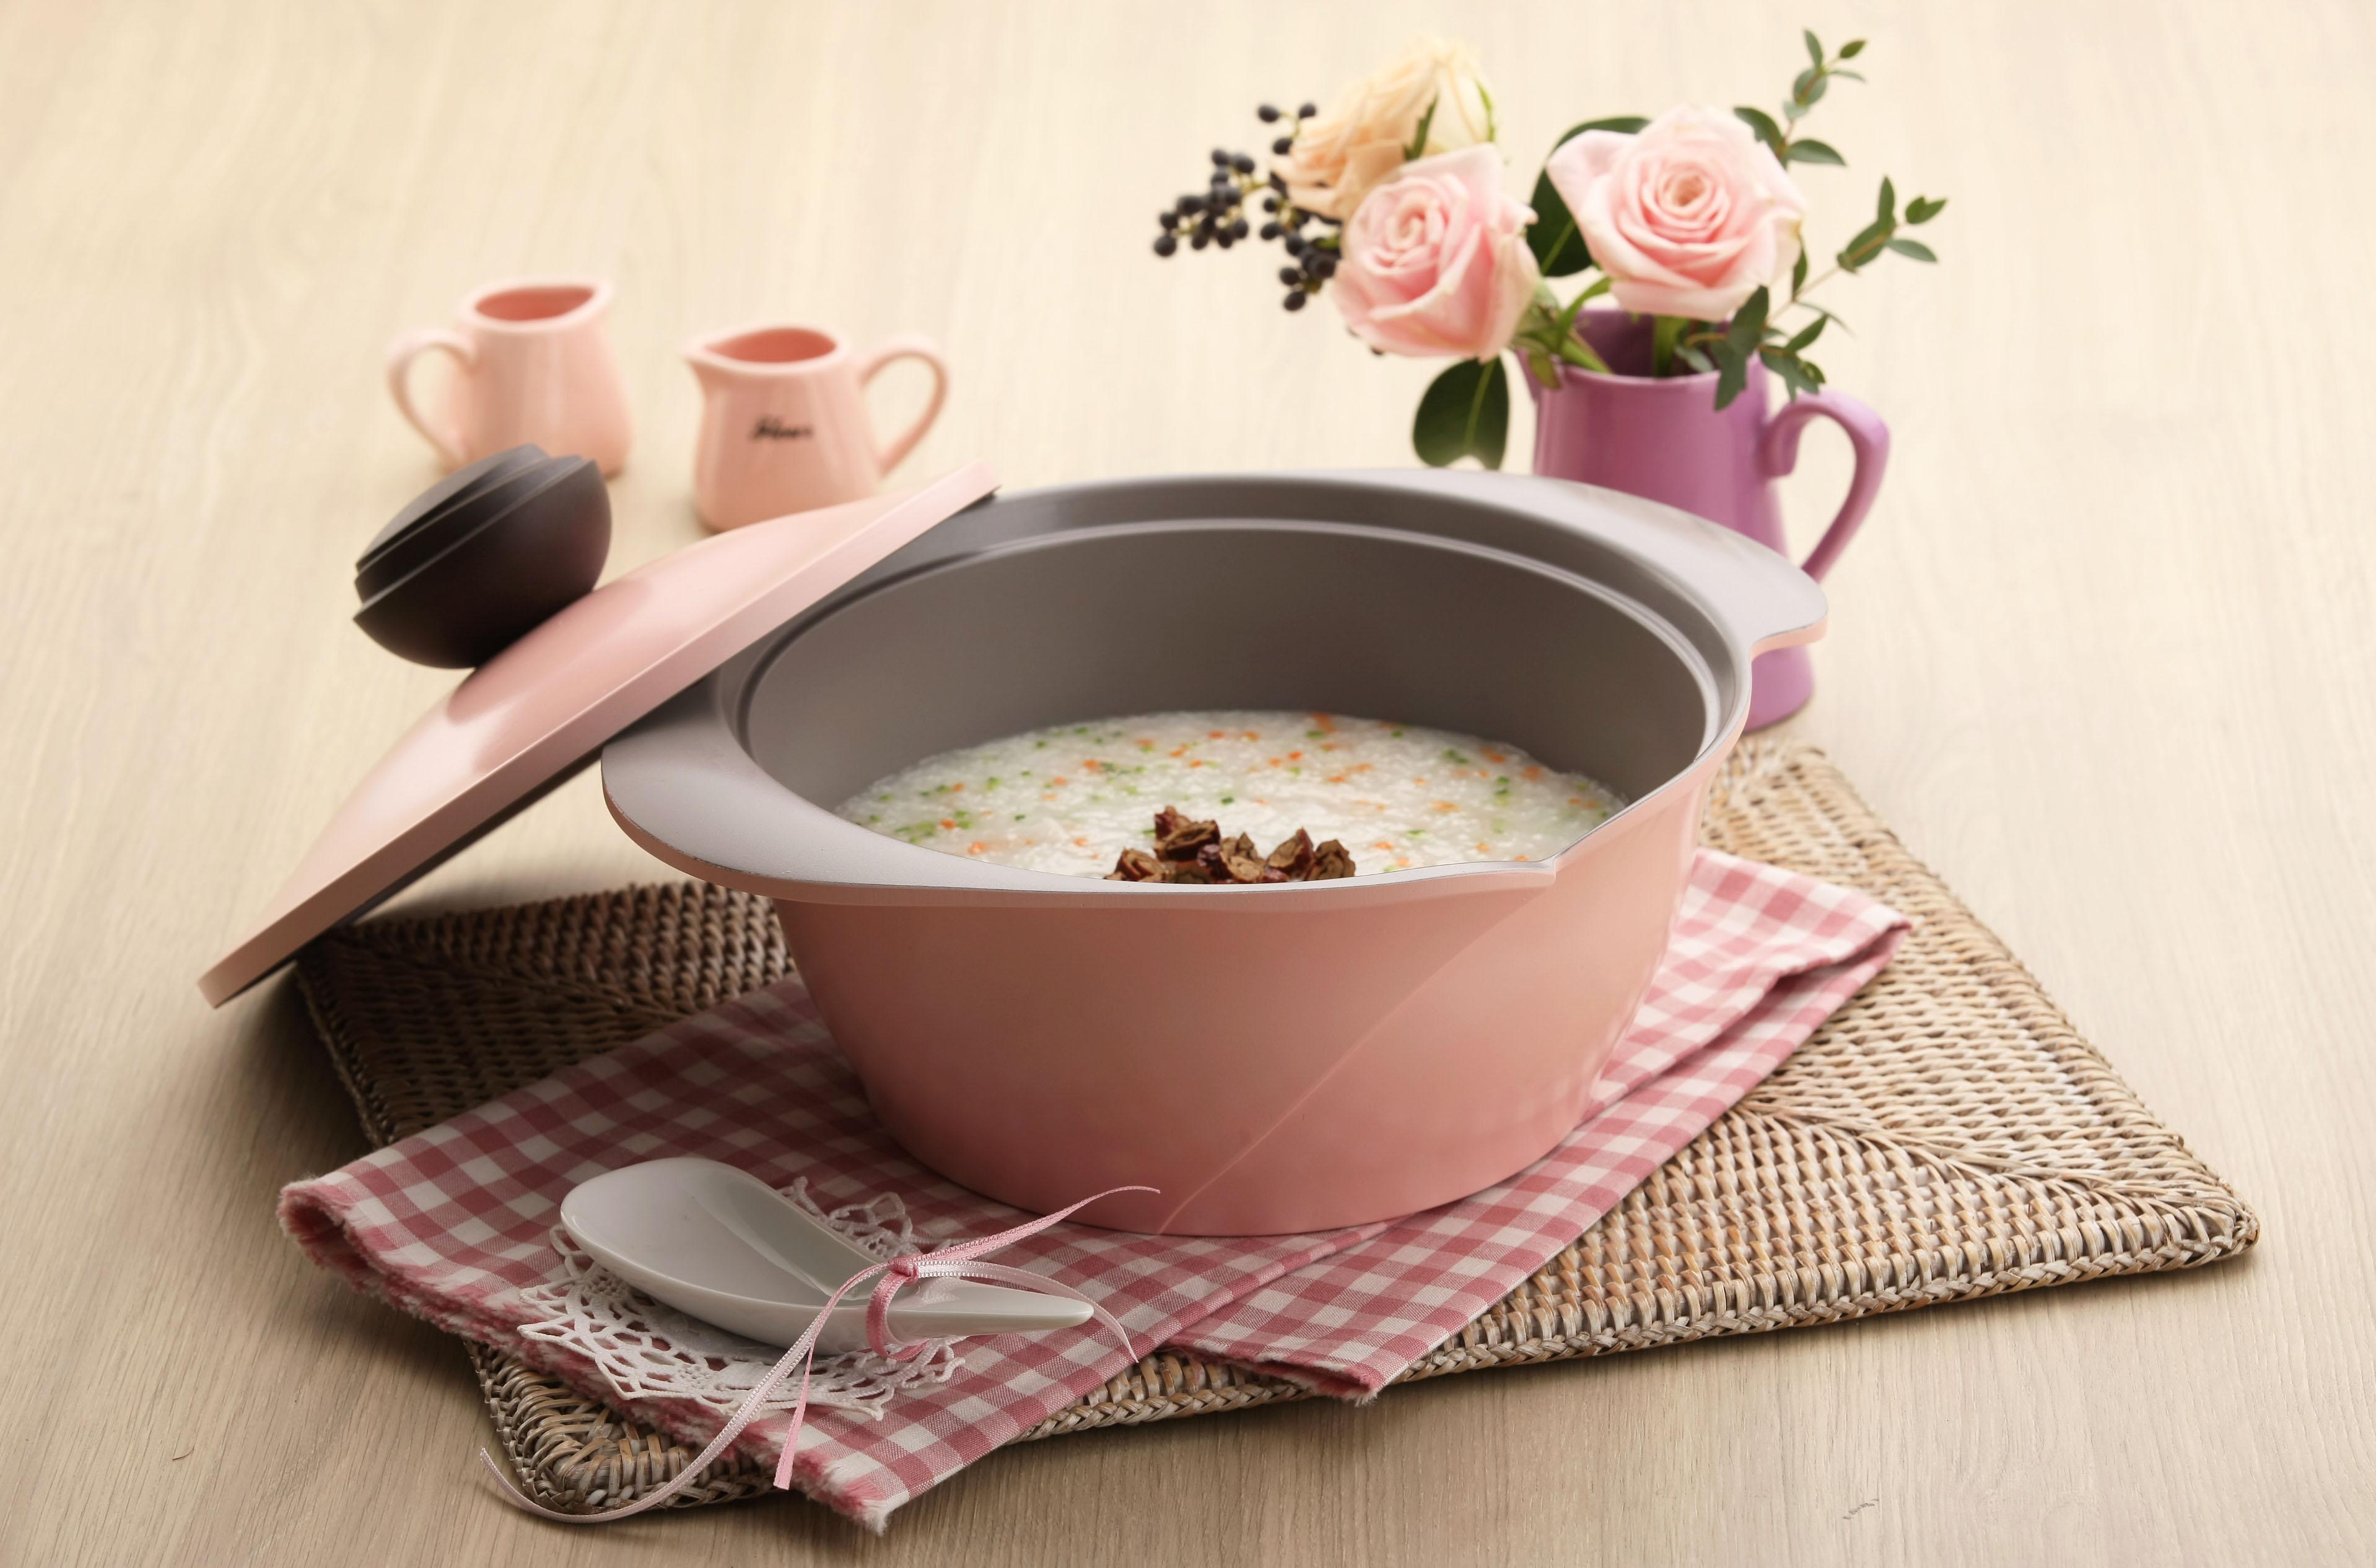 CHEF TOPF 陶瓷鍋